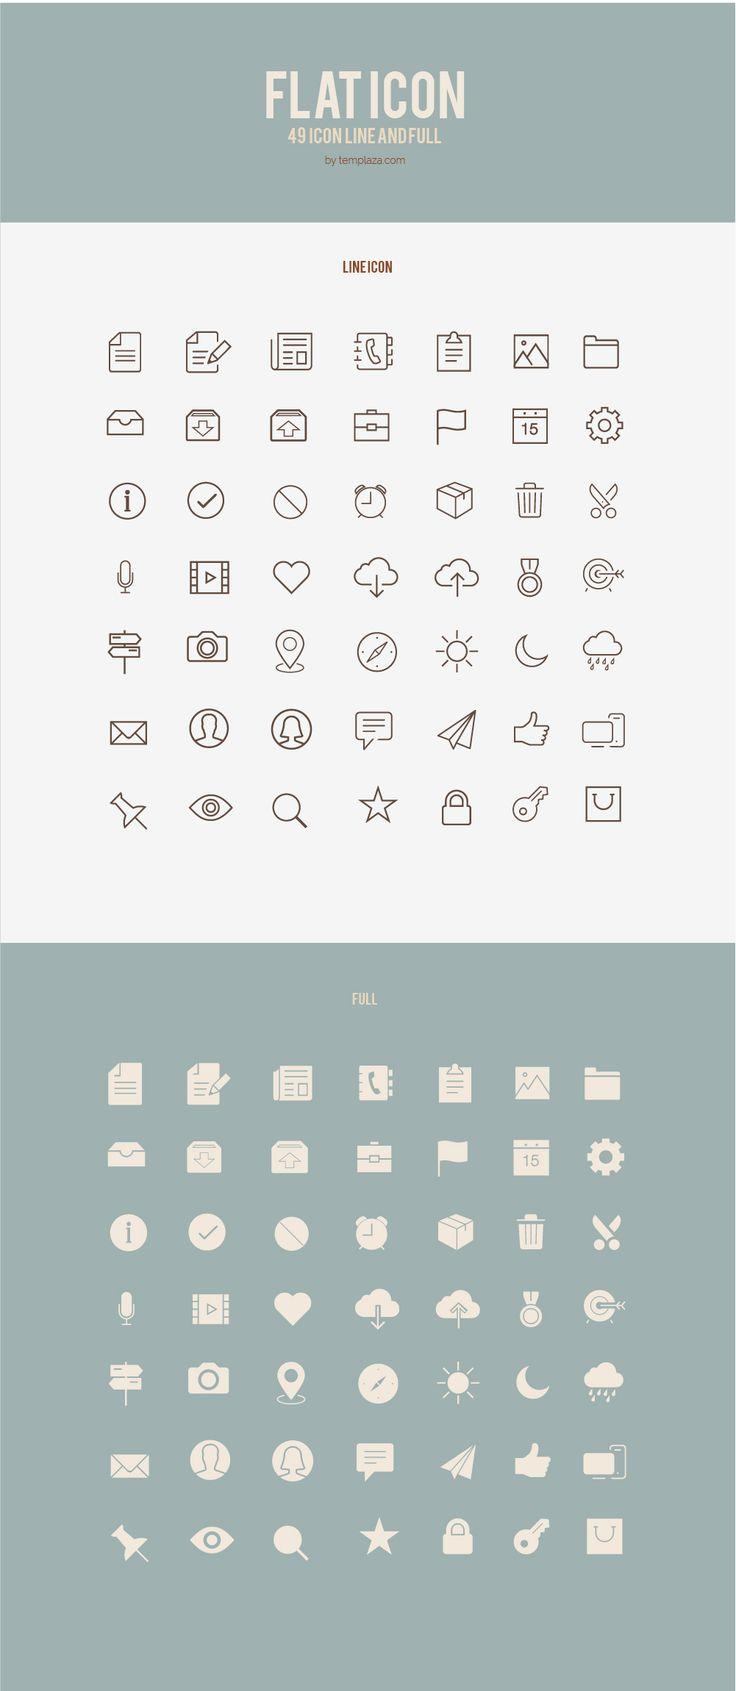 Flat icon- part 1